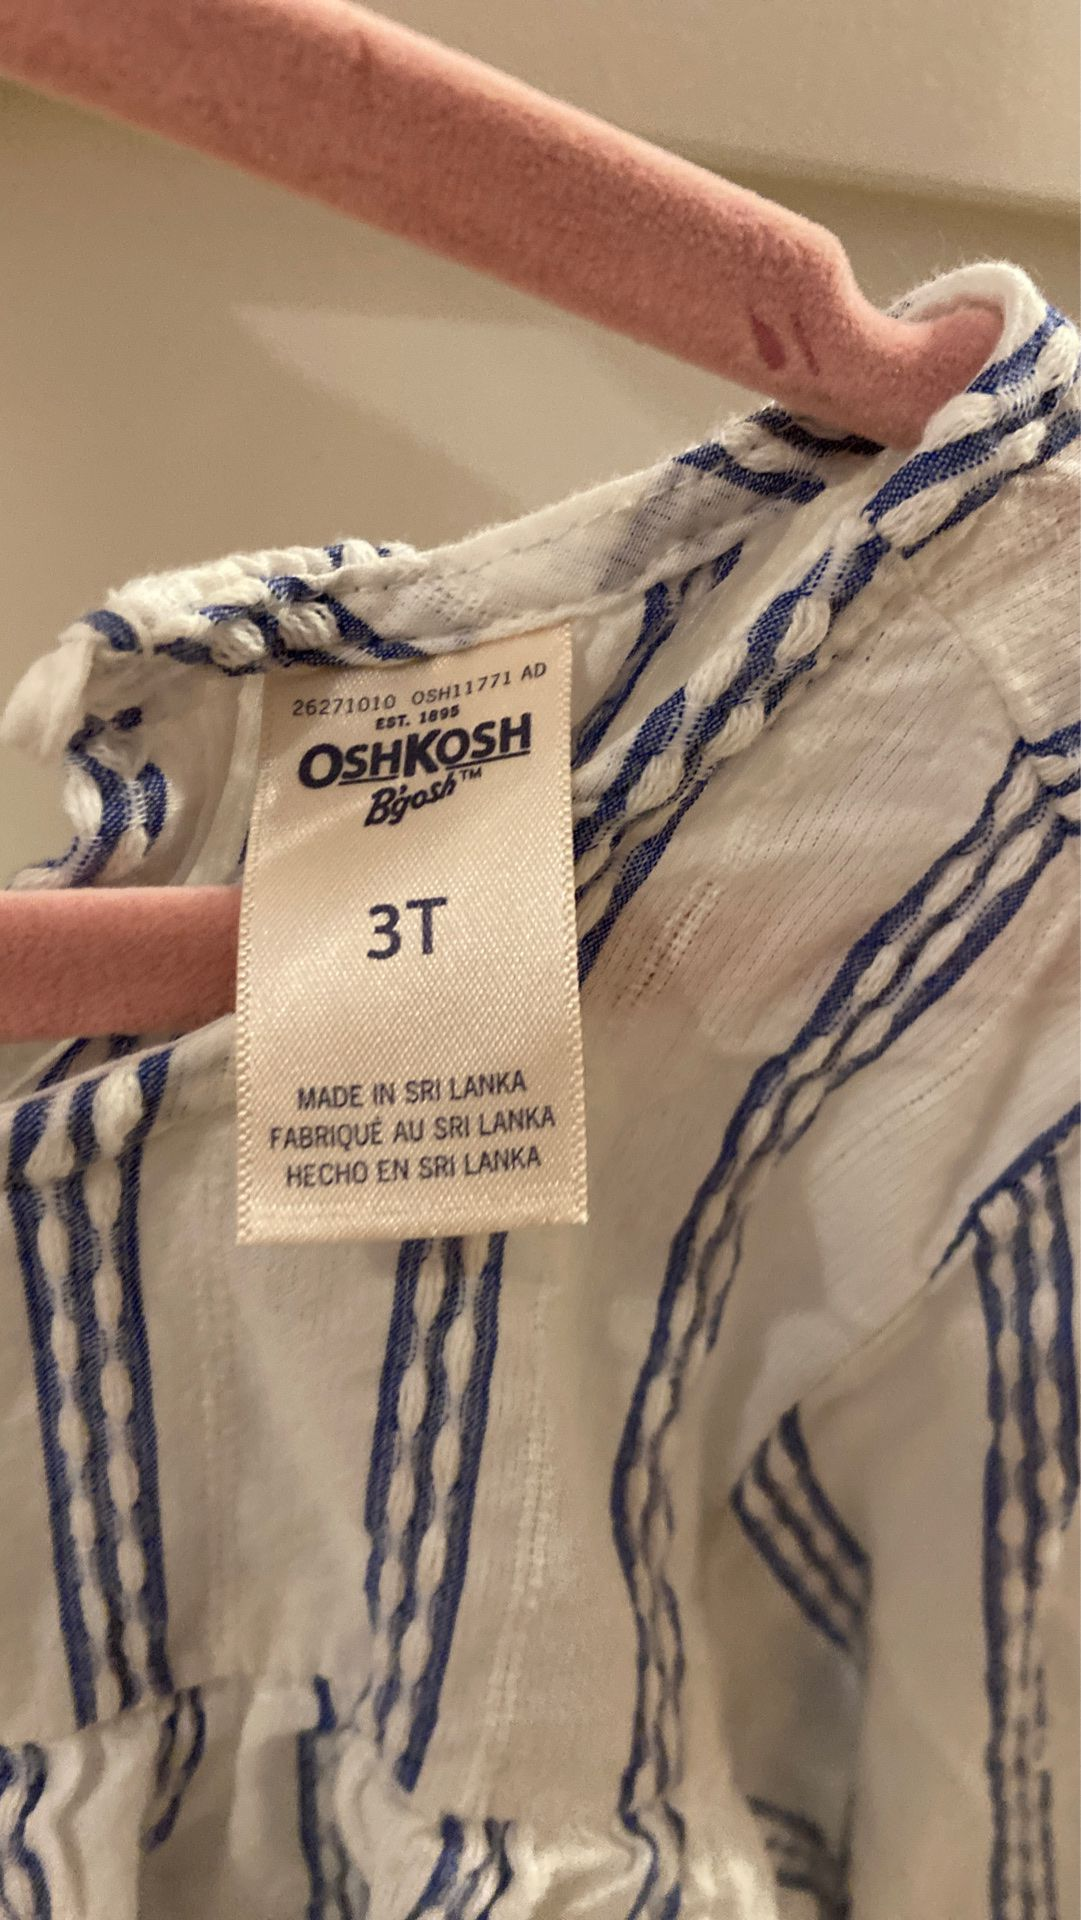 Oshkosh 3T blouse